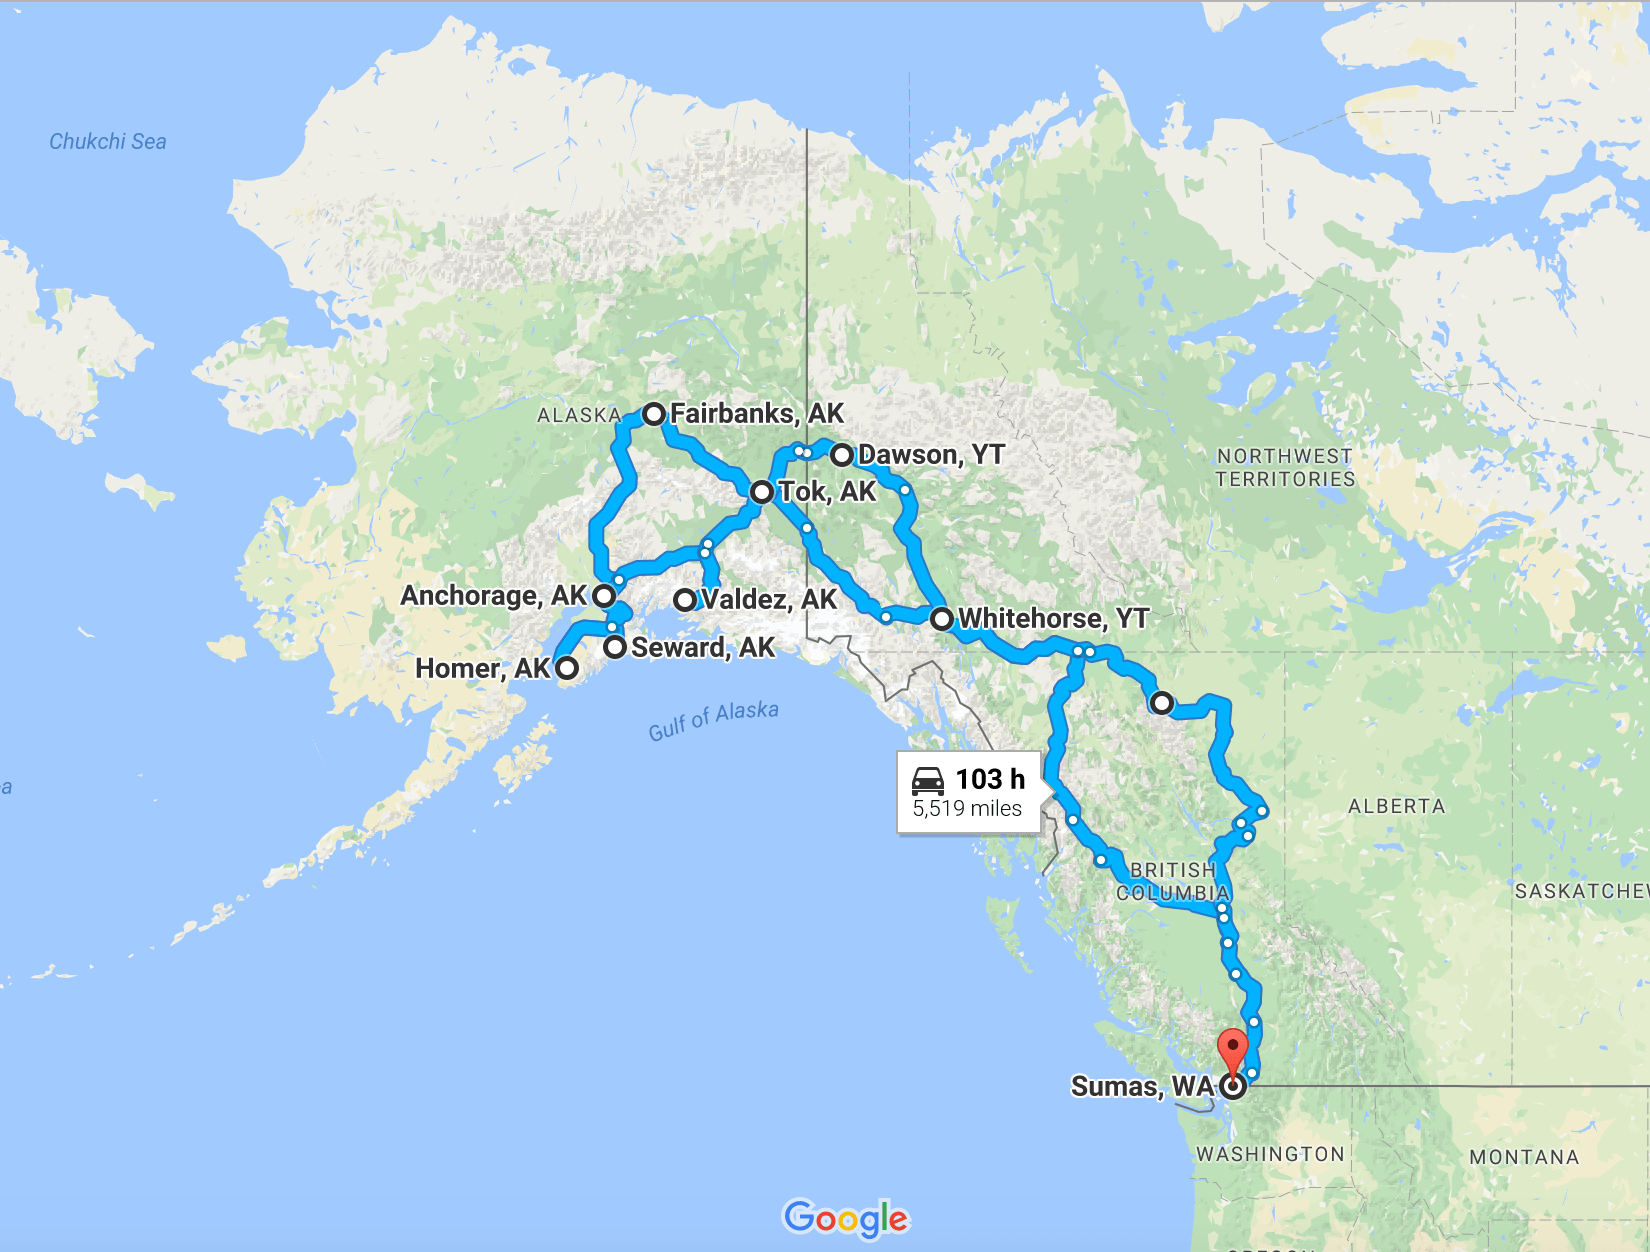 We crossed a major item off our travel bucket list last summer: we ...